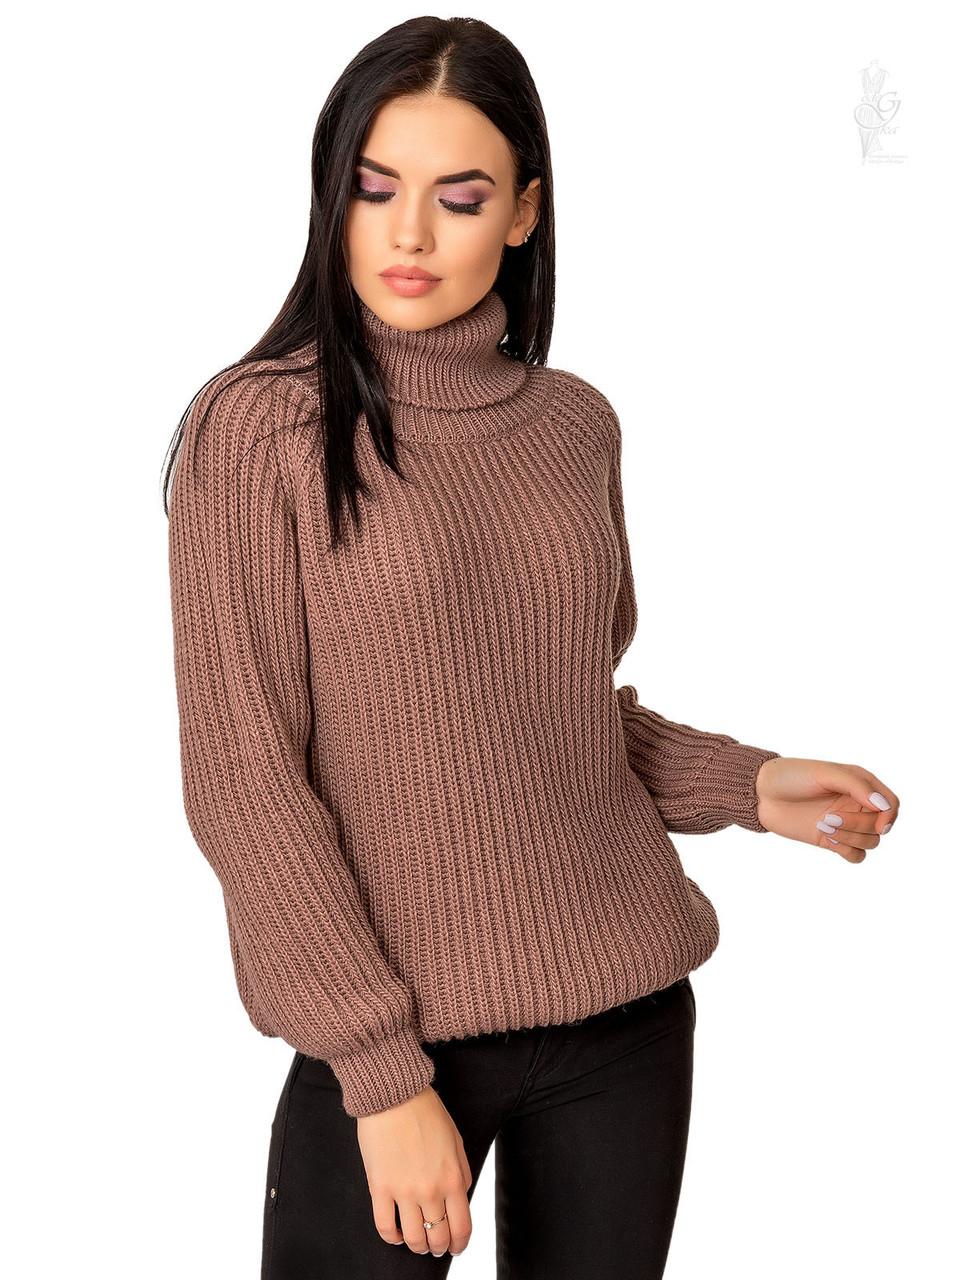 Женский свитер оверсайз Мара-1 из шерсти и акрила